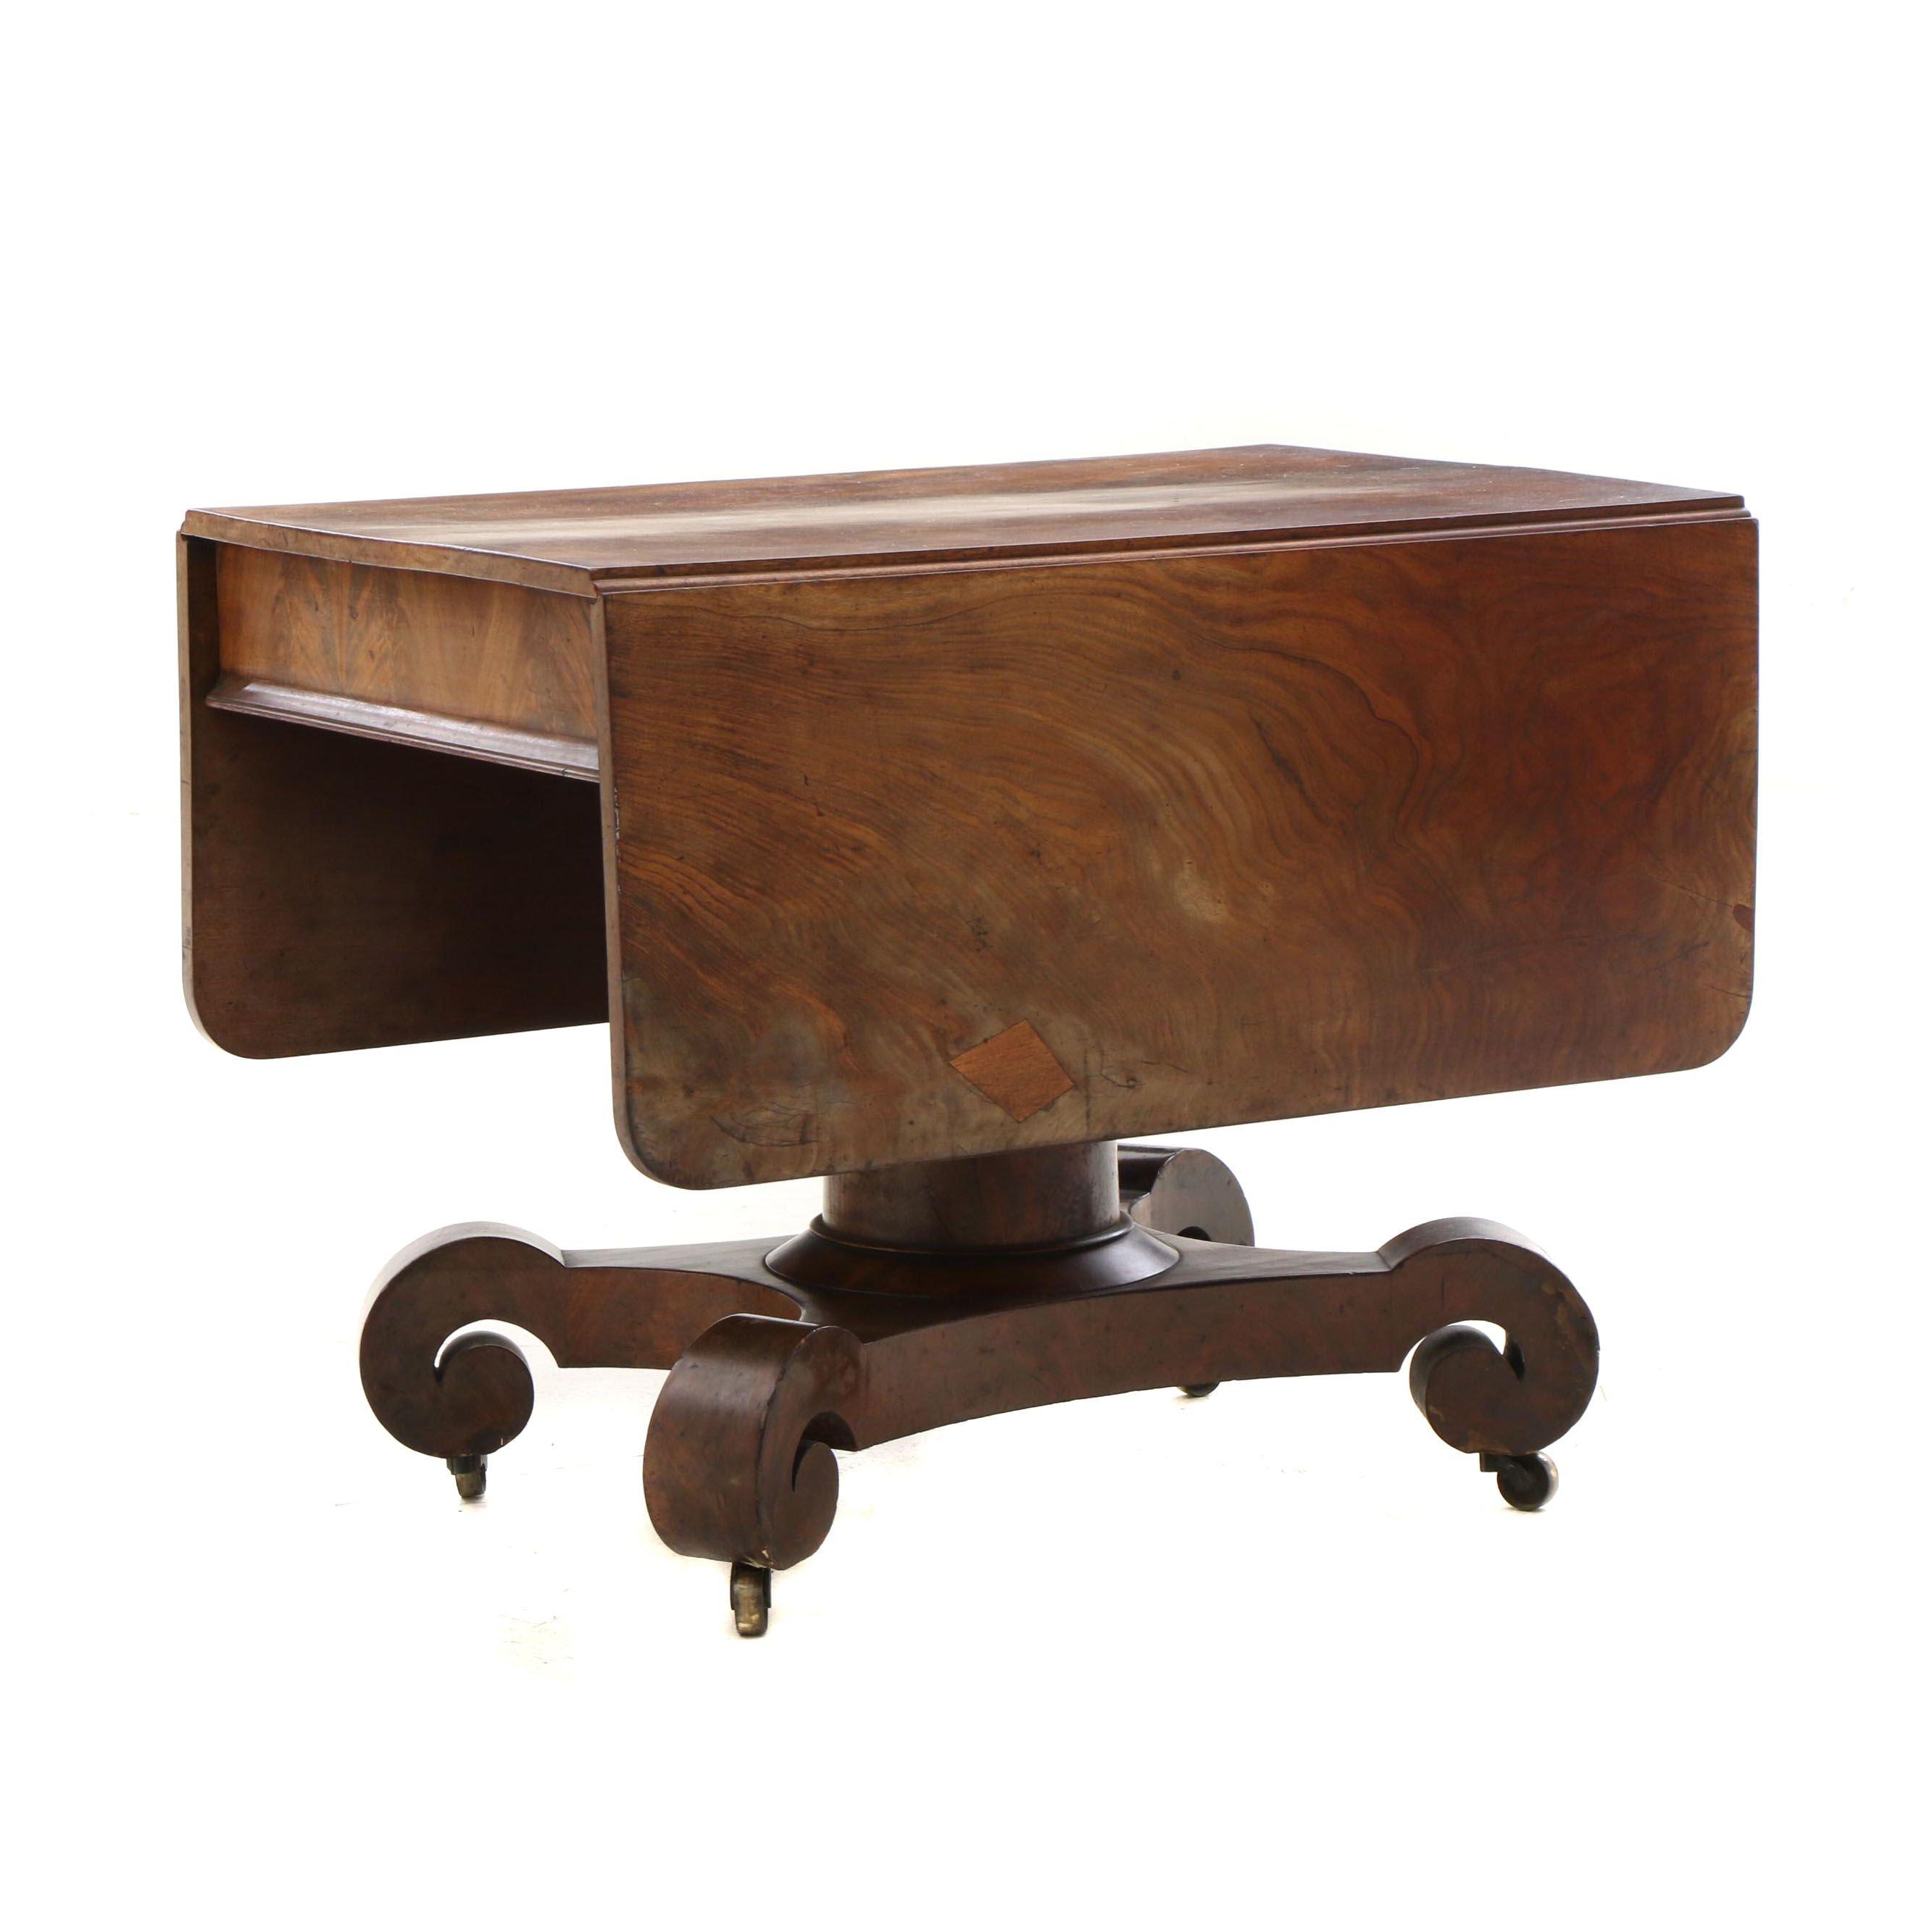 19th Century American Empire Style Drop Leaf Mahogany Table